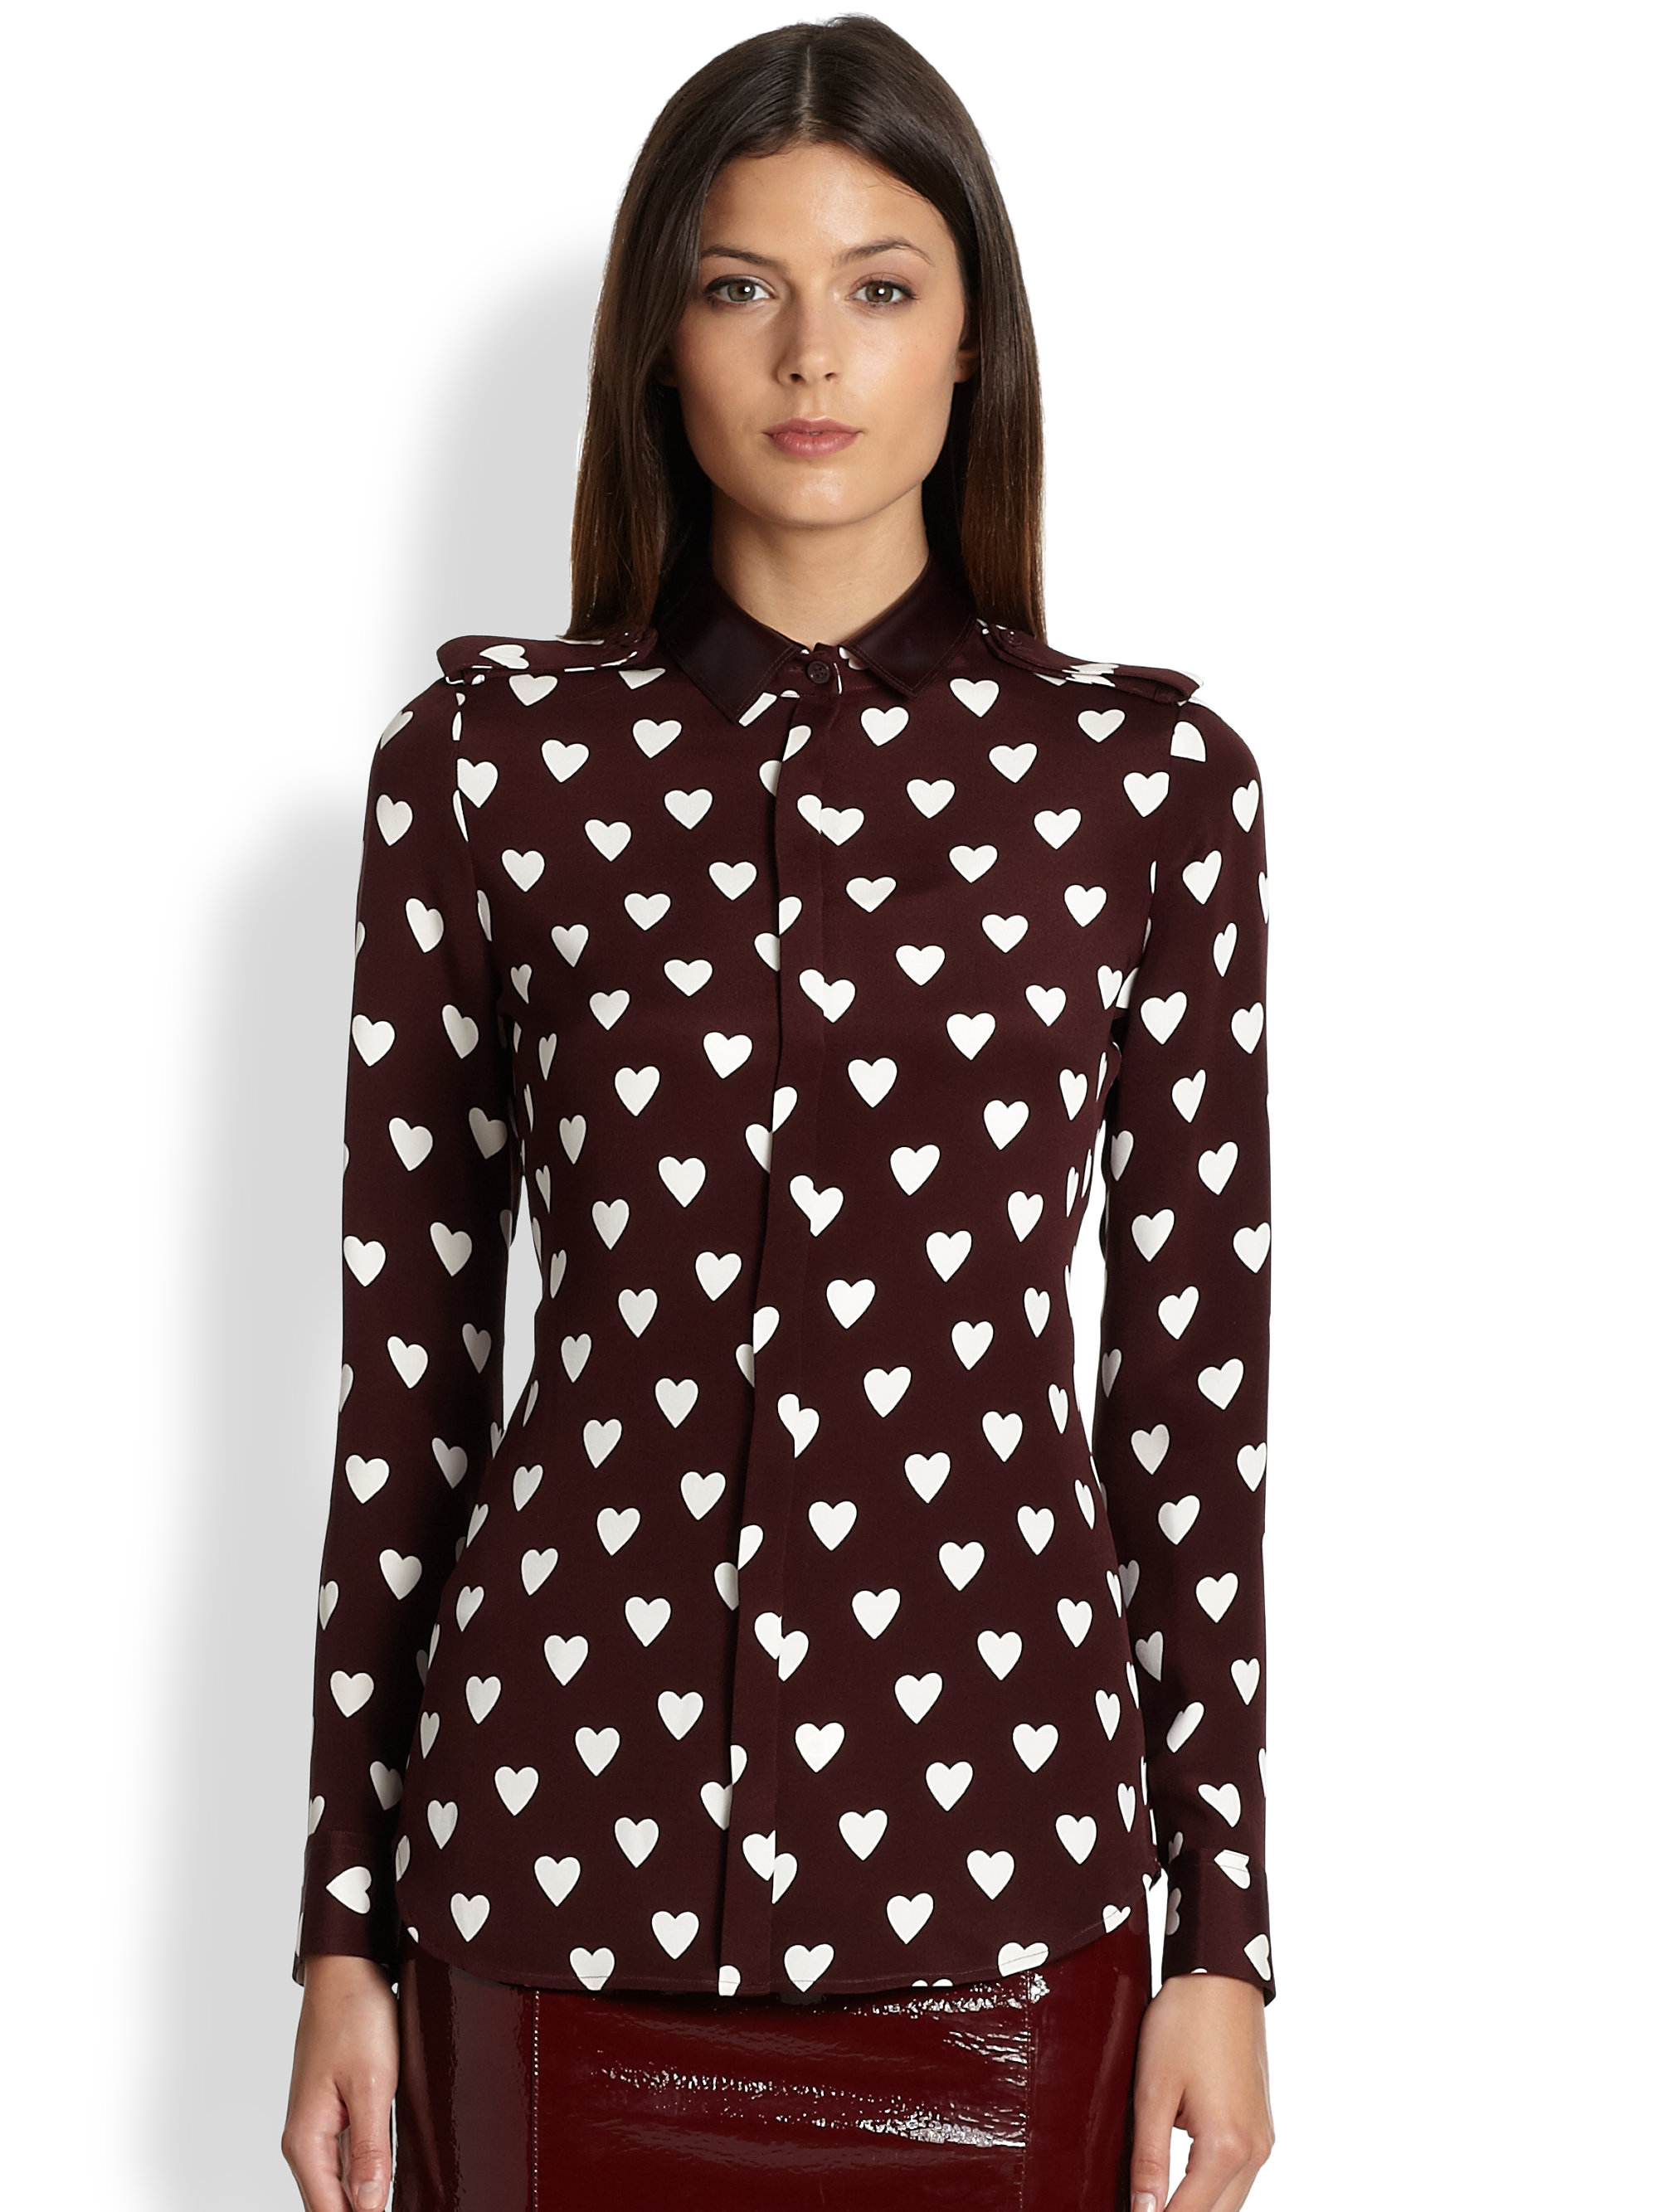 65cfed79a185f Lyst - Burberry Prorsum Silk Heart Print Shirt in Red